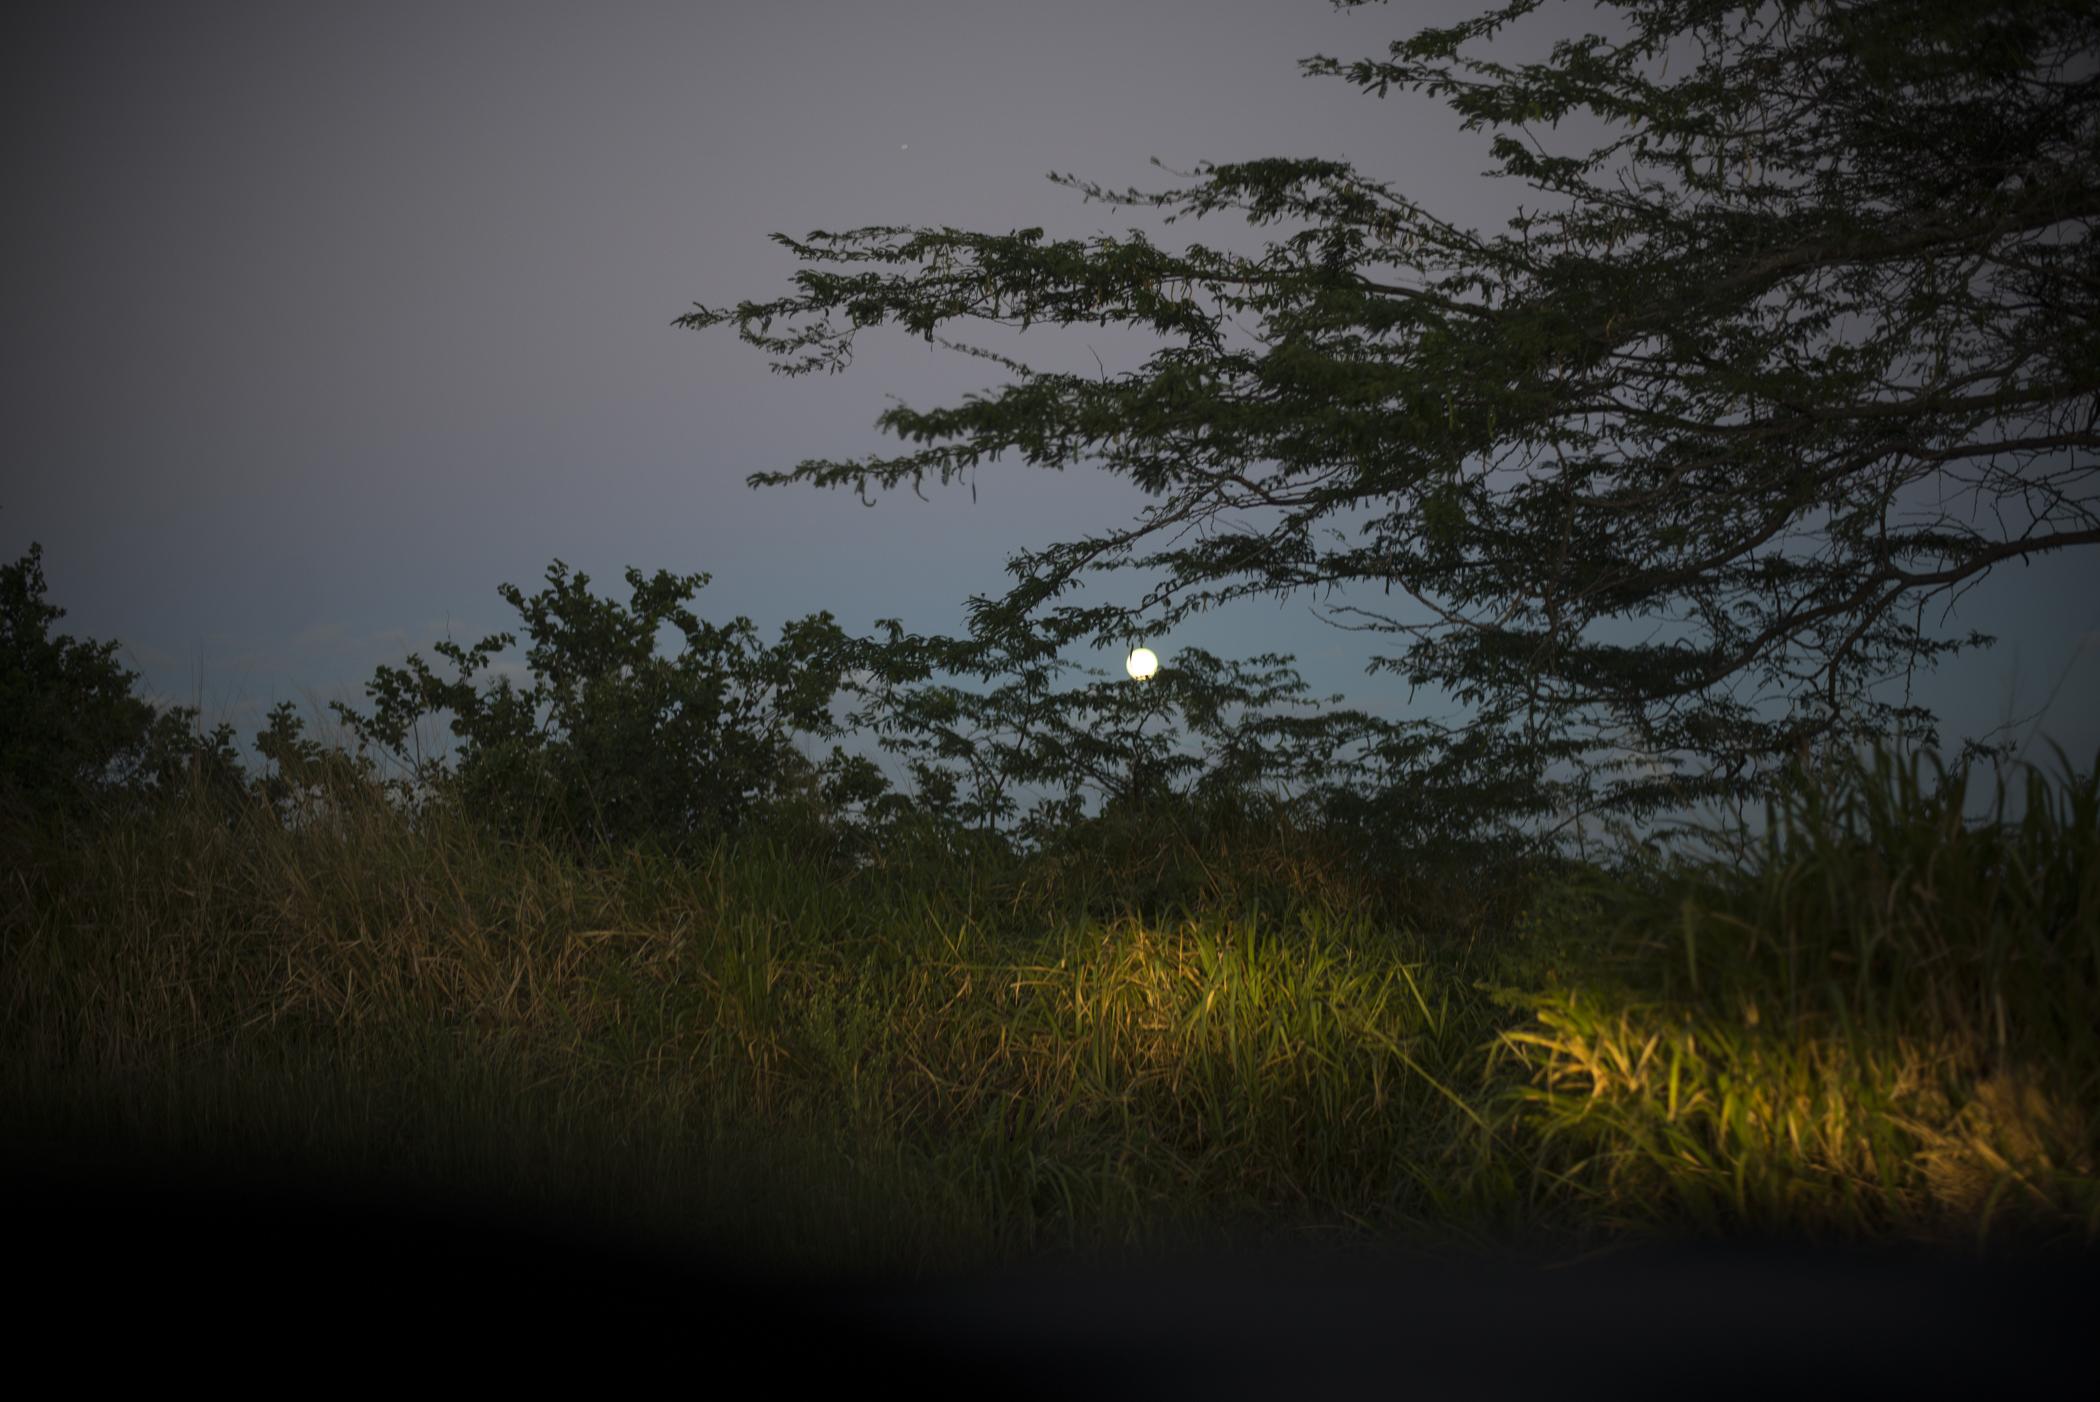 012014-Culebra-JuliaLuckettPhotography-40